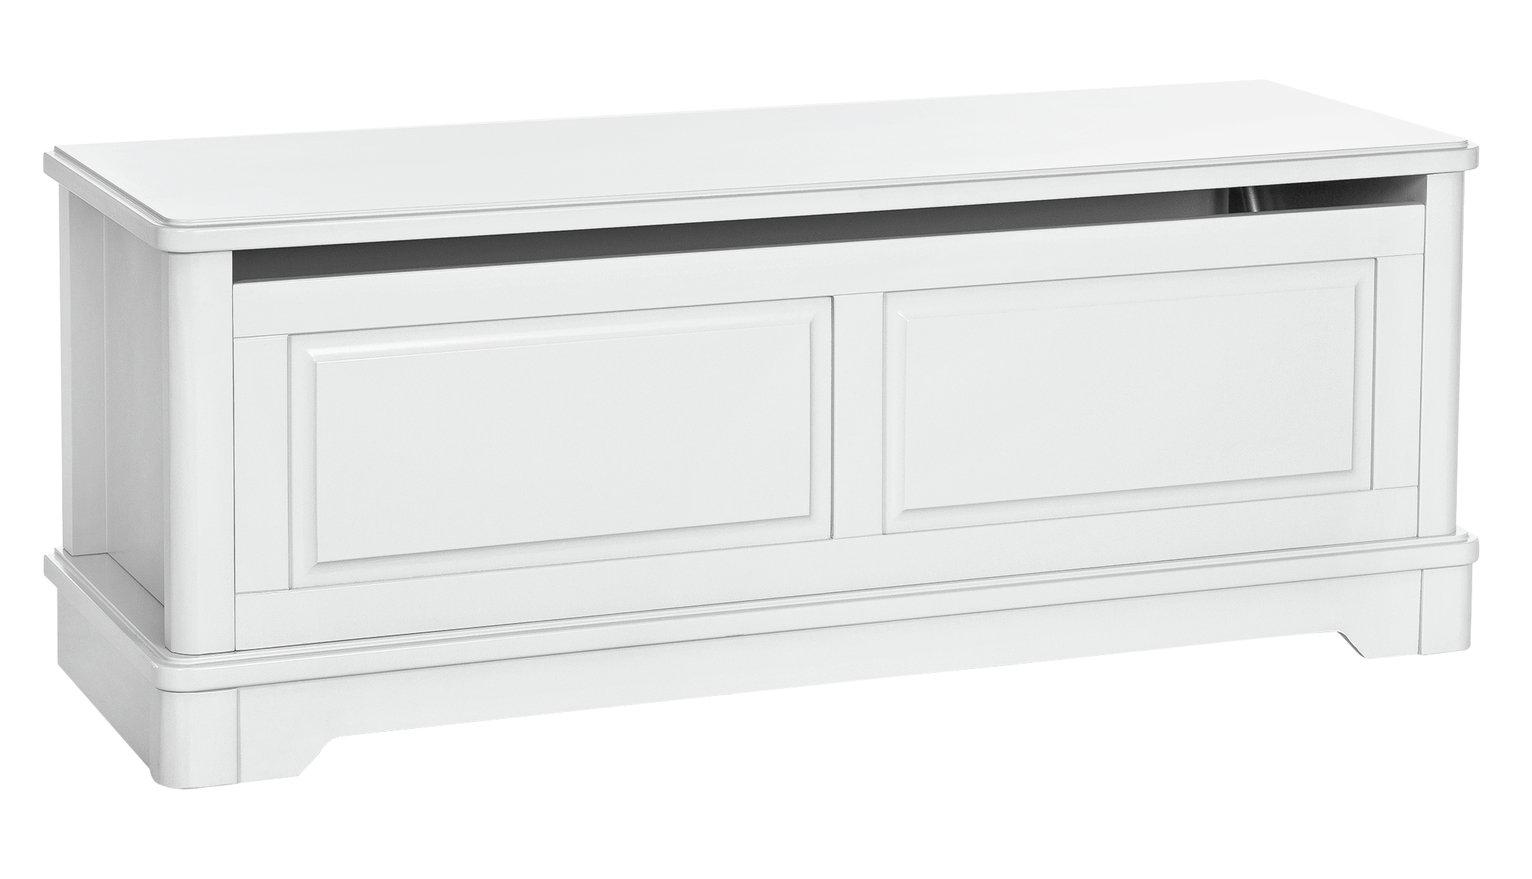 Argos Home Ashbourne Blanket Box - Soft White